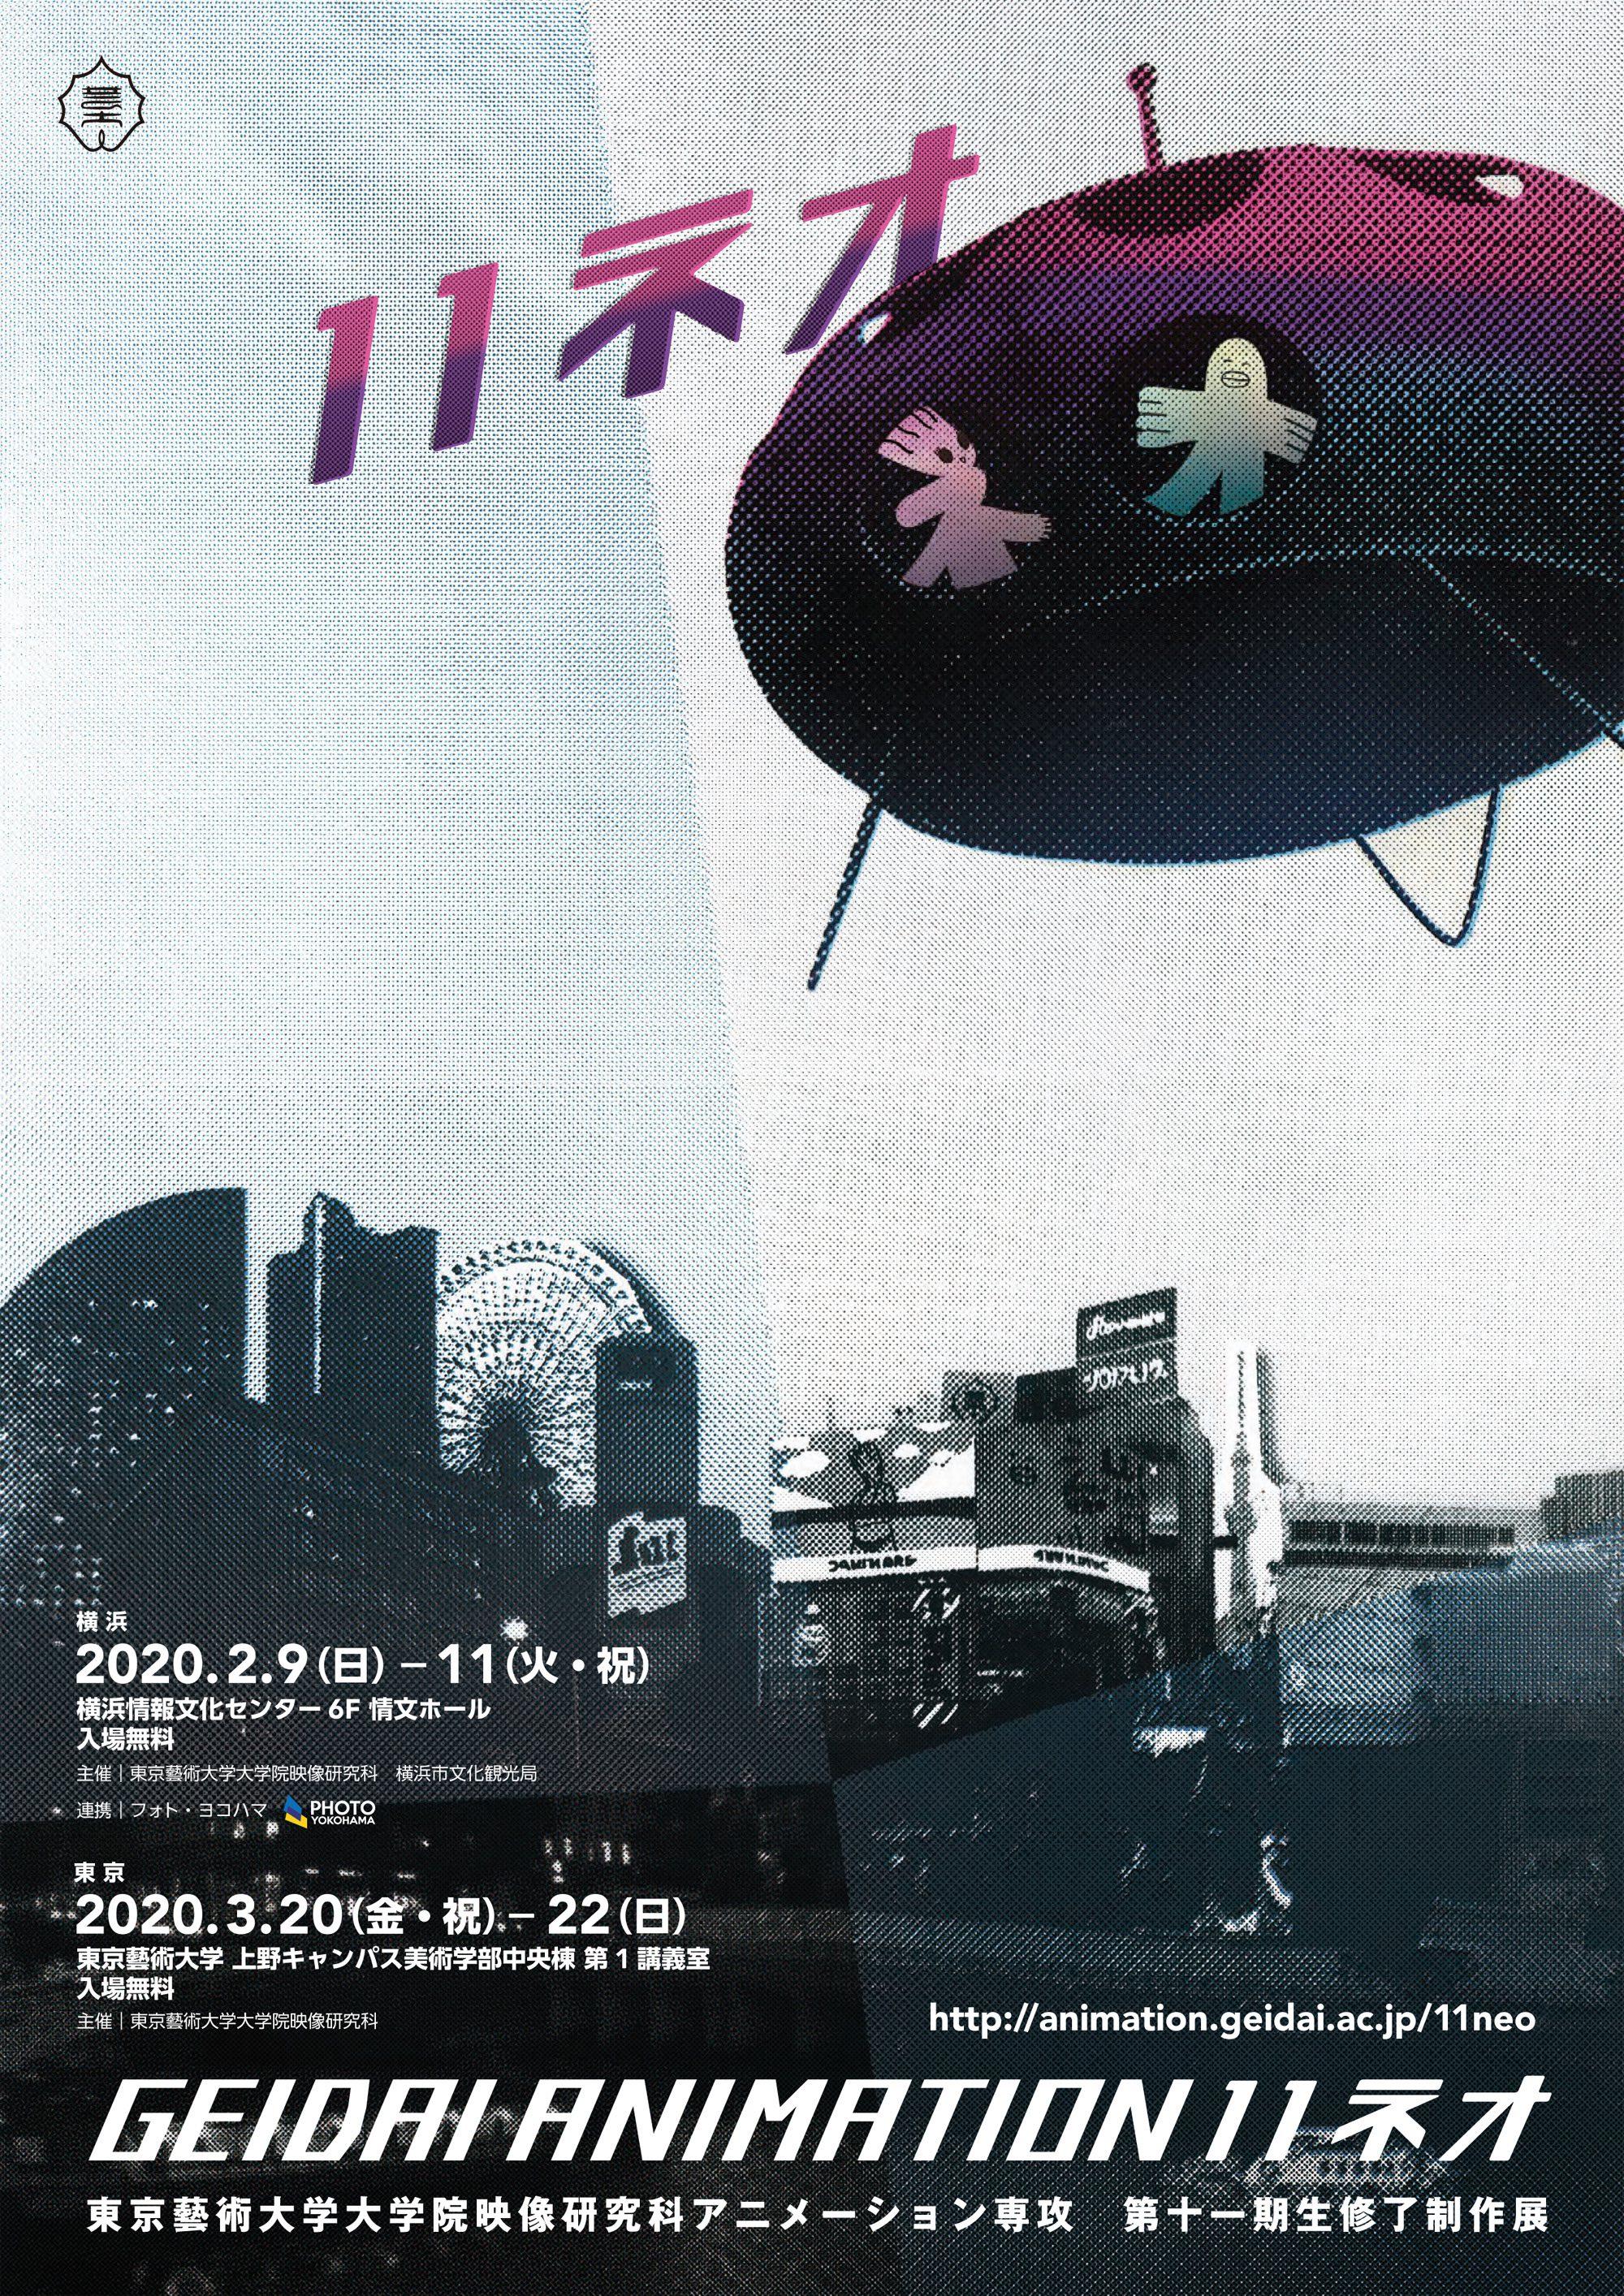 東京藝術大学大学院映像研究科アニメーション専攻 第十一期生修了制作展 11ネオ GEIDAI ANIMATION